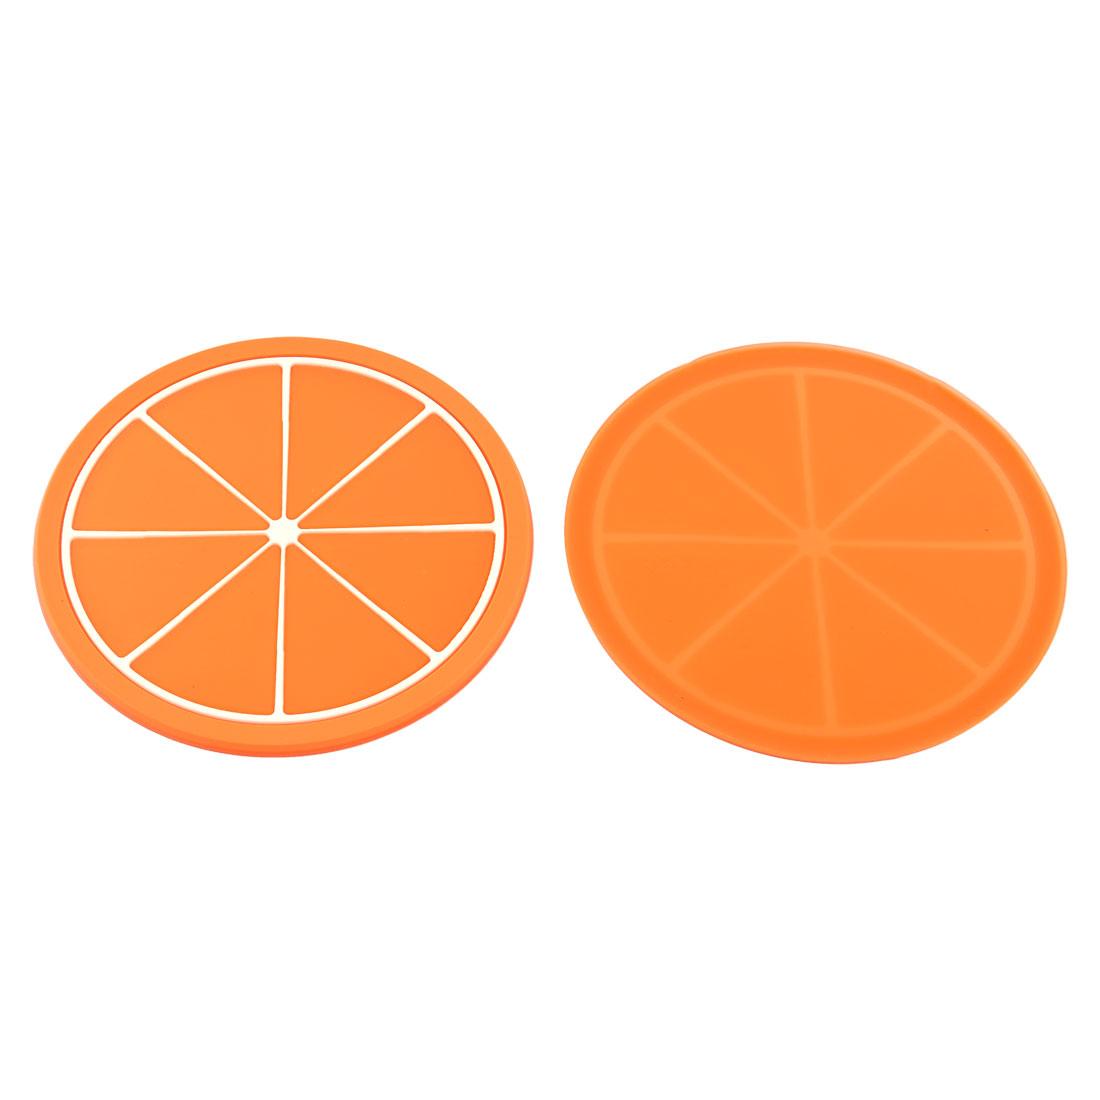 Household Silicone Orange Shaped Teapot Bottle Cup Coasters Mat Orange 2 Pcs